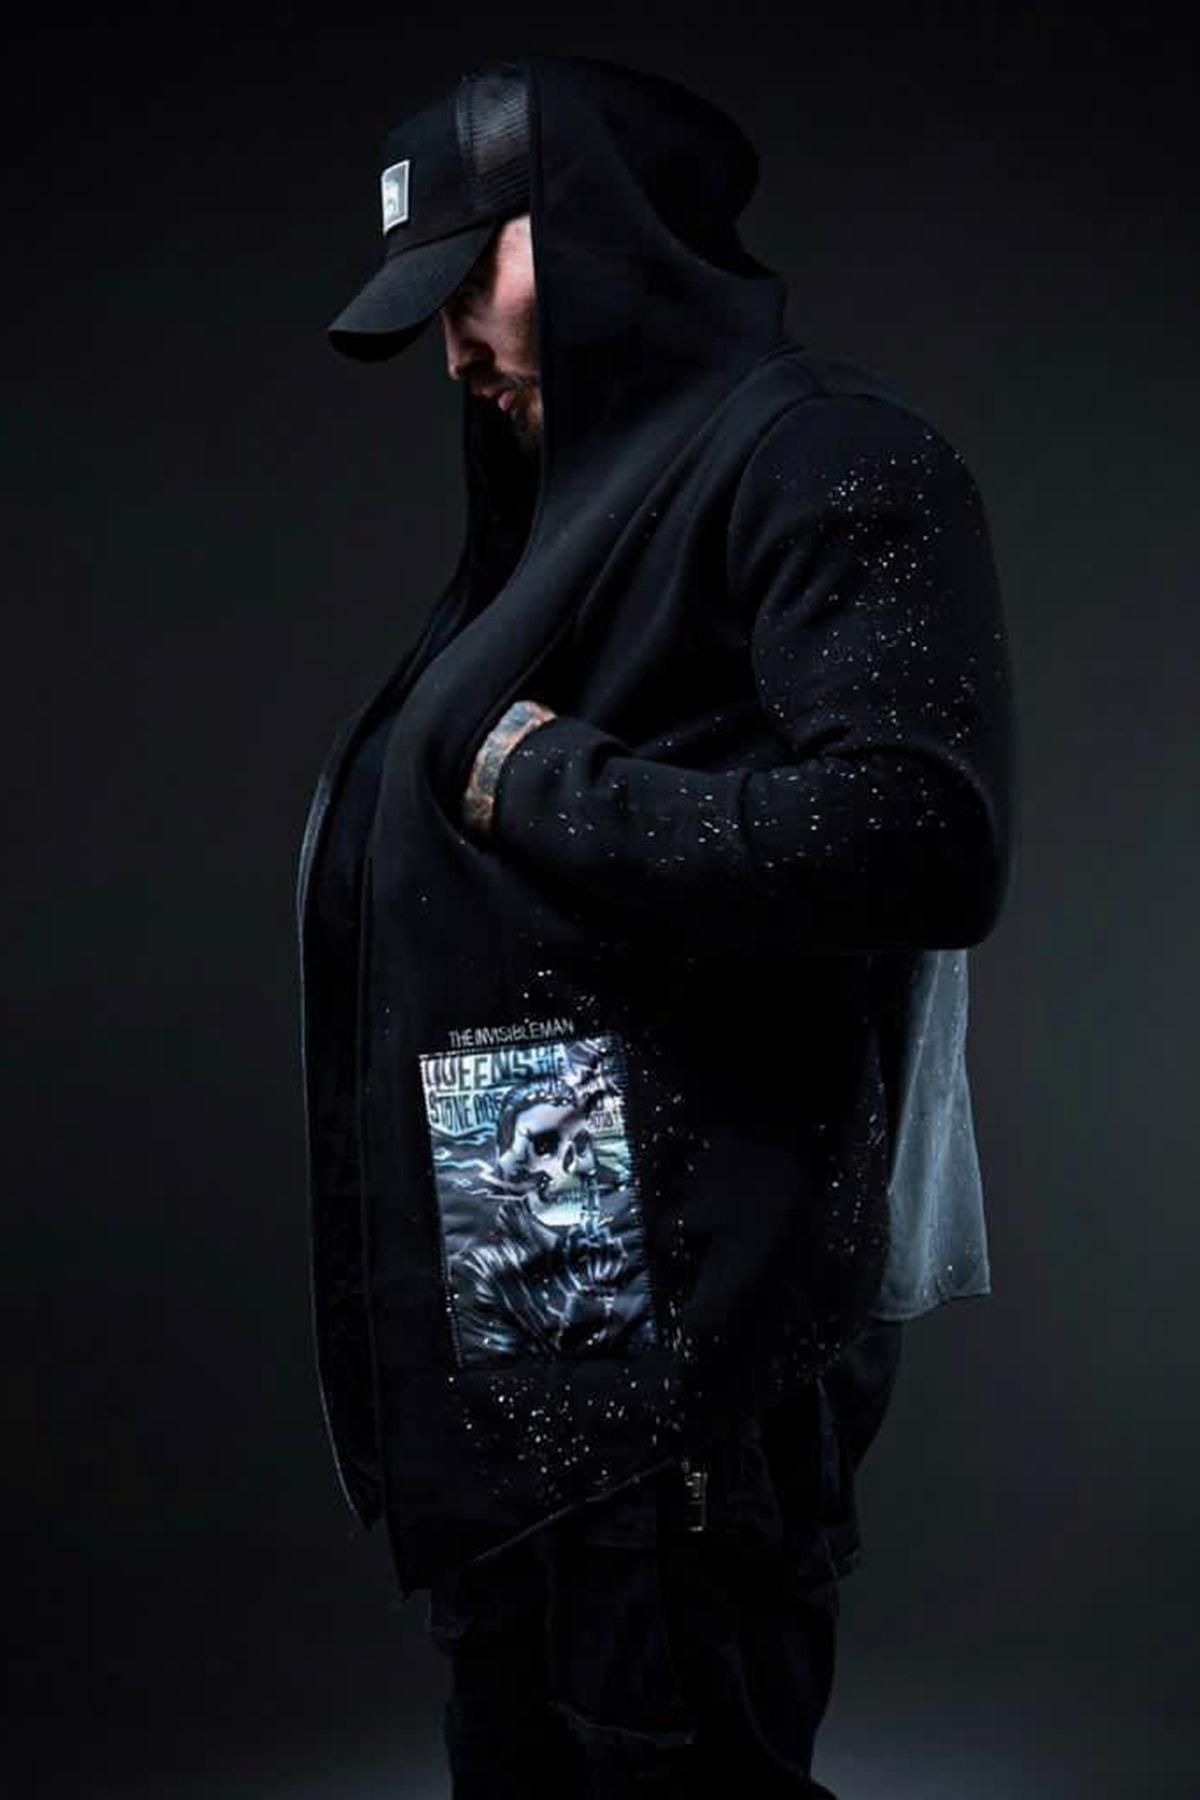 XHAN Siyah Kamuflaj Baskılı Sweatshirt 1KXE8-44333-02 1